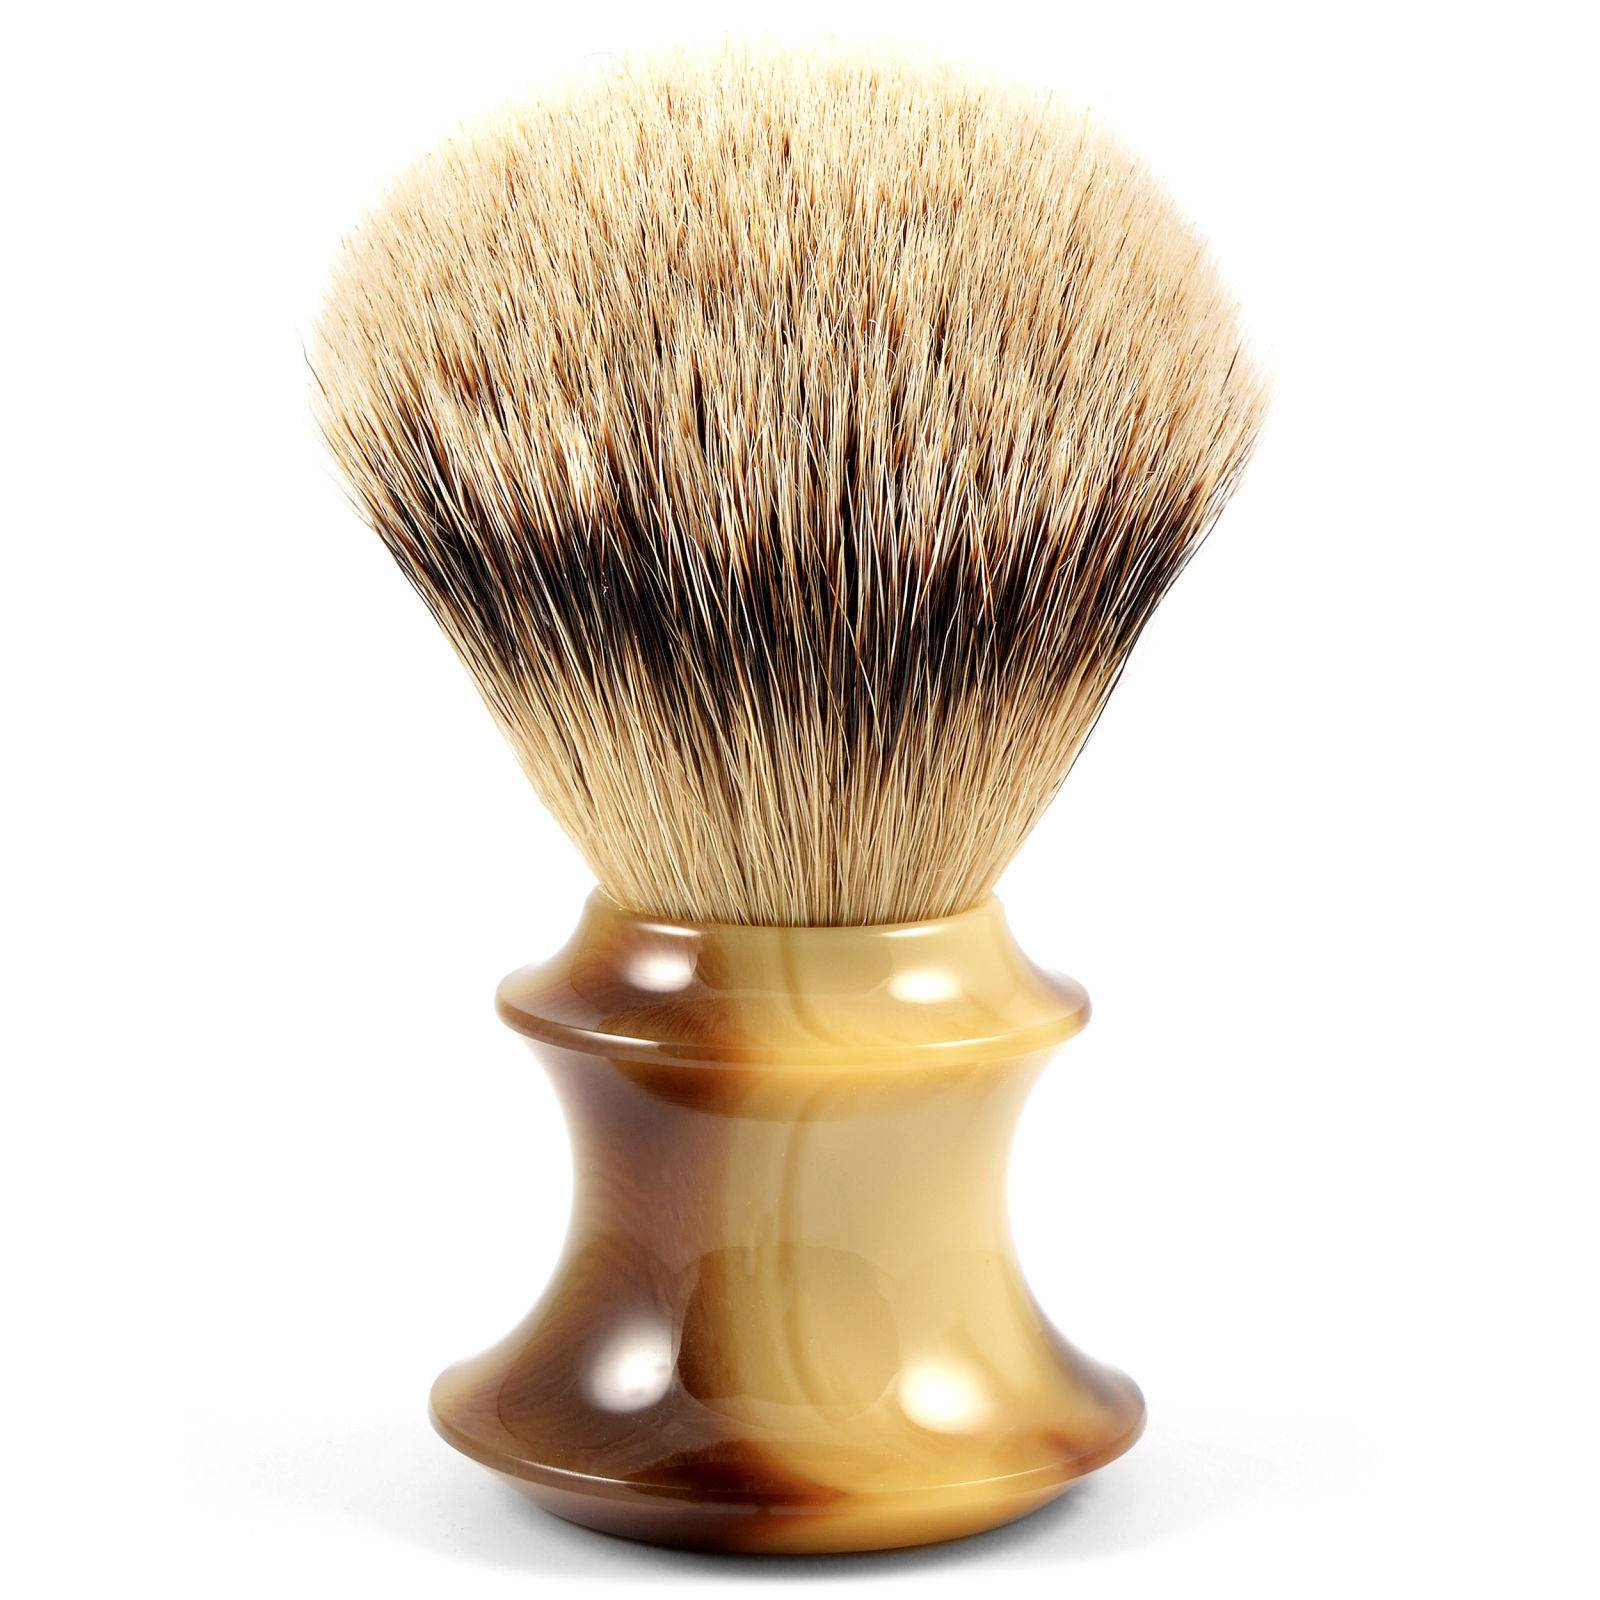 Frank Shaving Sarvikuvioinen Silvertip Mäyränkarva Partasuti